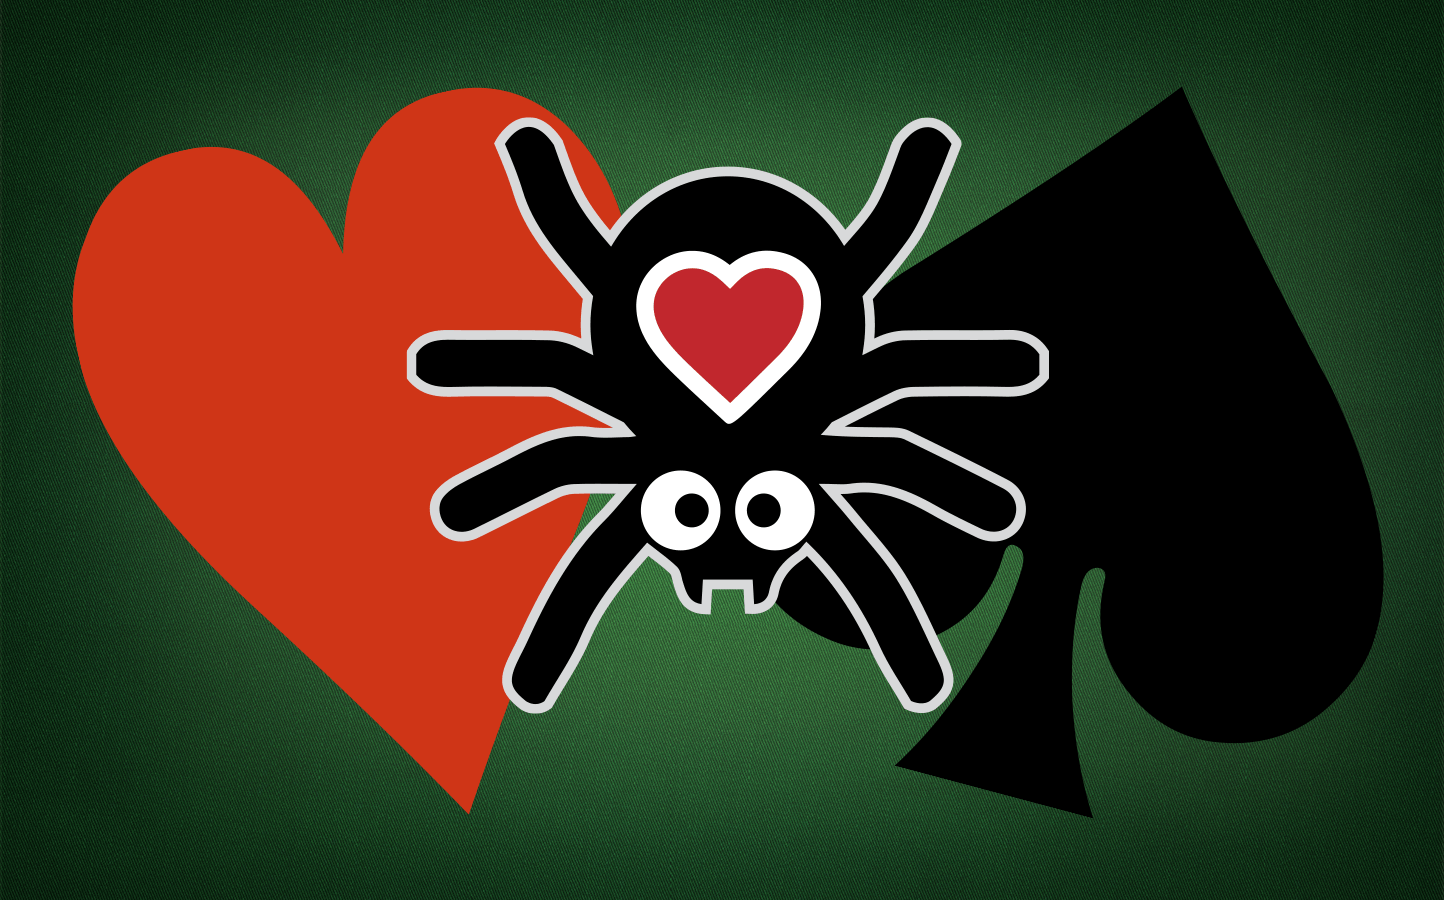 Lesson 4: 2 Suits Spider Solitaire